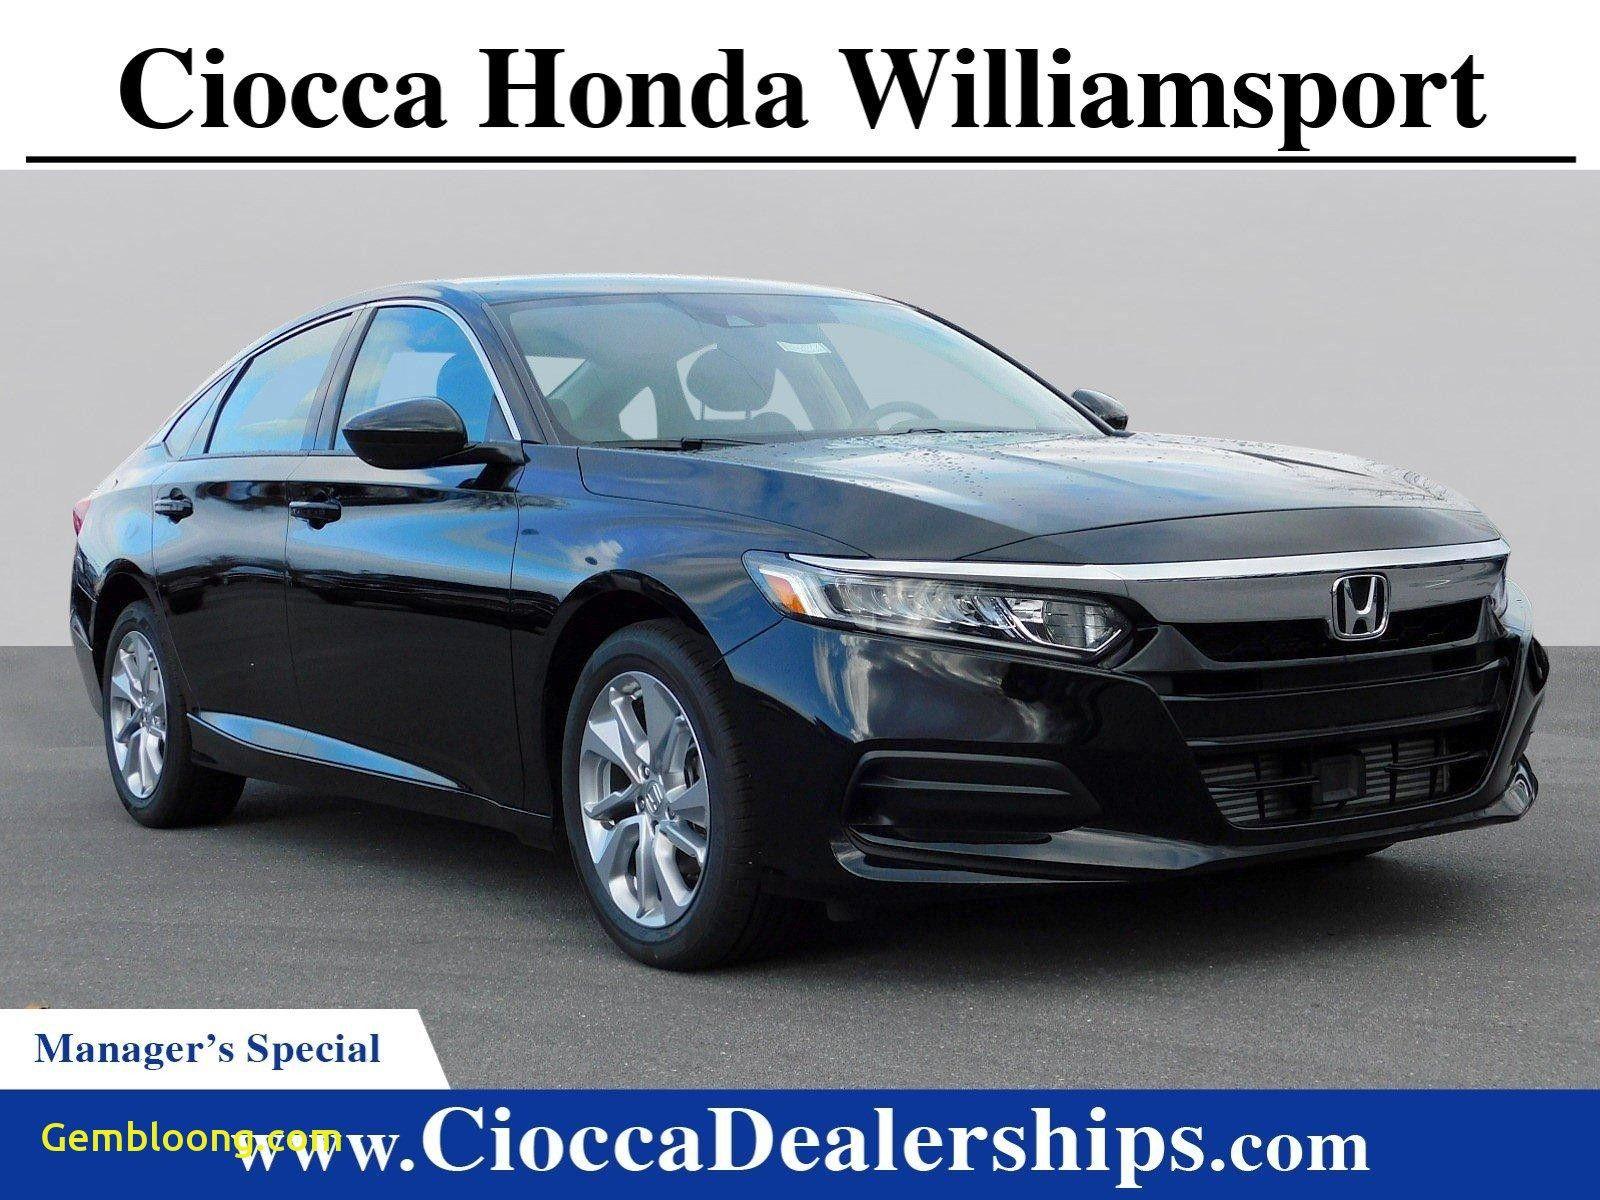 Cars For Sale Near Me Honda Accord New Crystal Black Pearl 2019 Honda Accord Sedan For Sale At In 2020 Honda Accord Honda Lease Deals